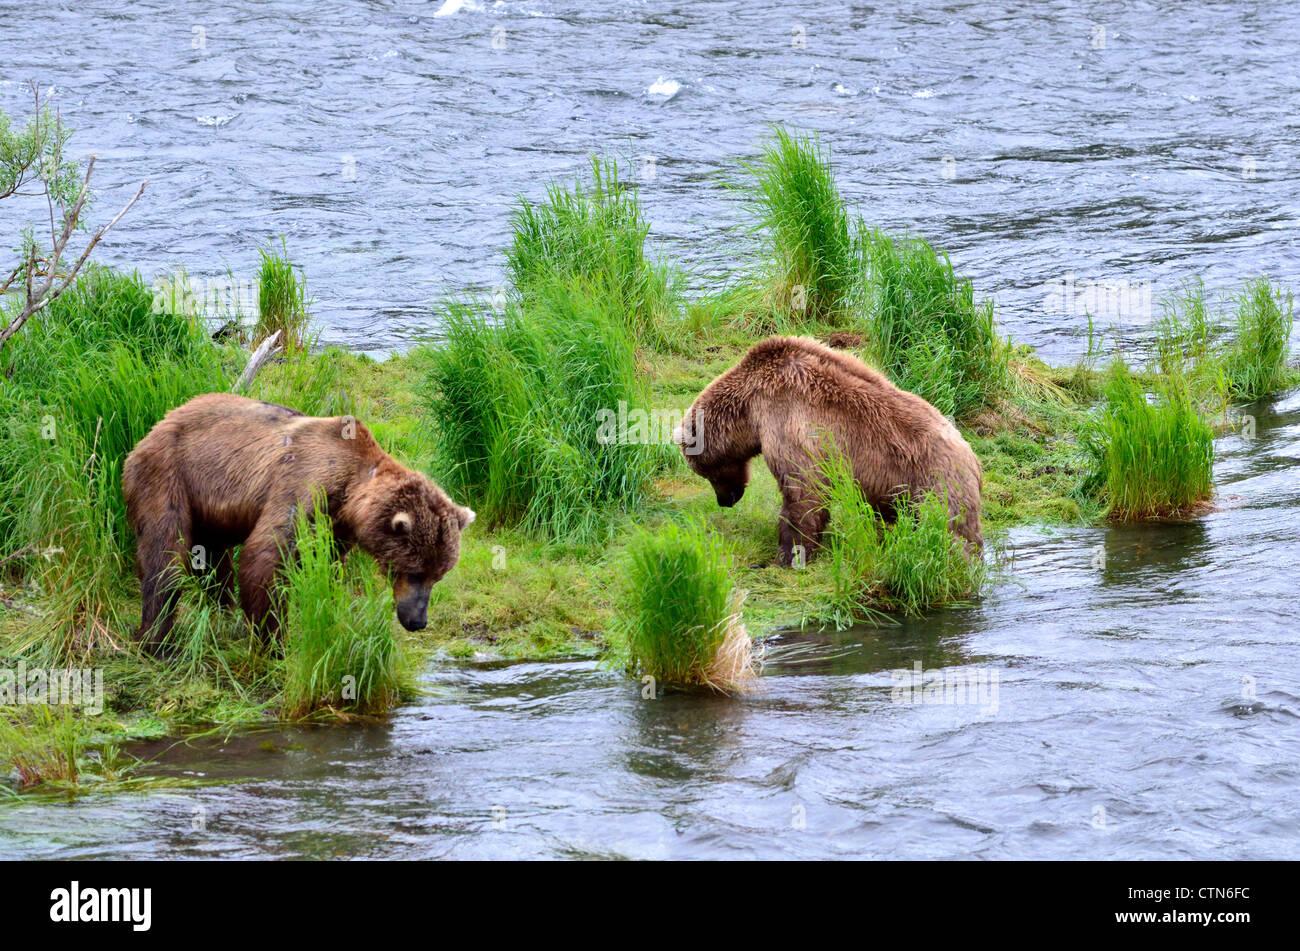 Zwei Braunbären konfrontieren einander am Brooks River. Katmai Nationalpark und Reservat. Alaska, USA. Stockbild